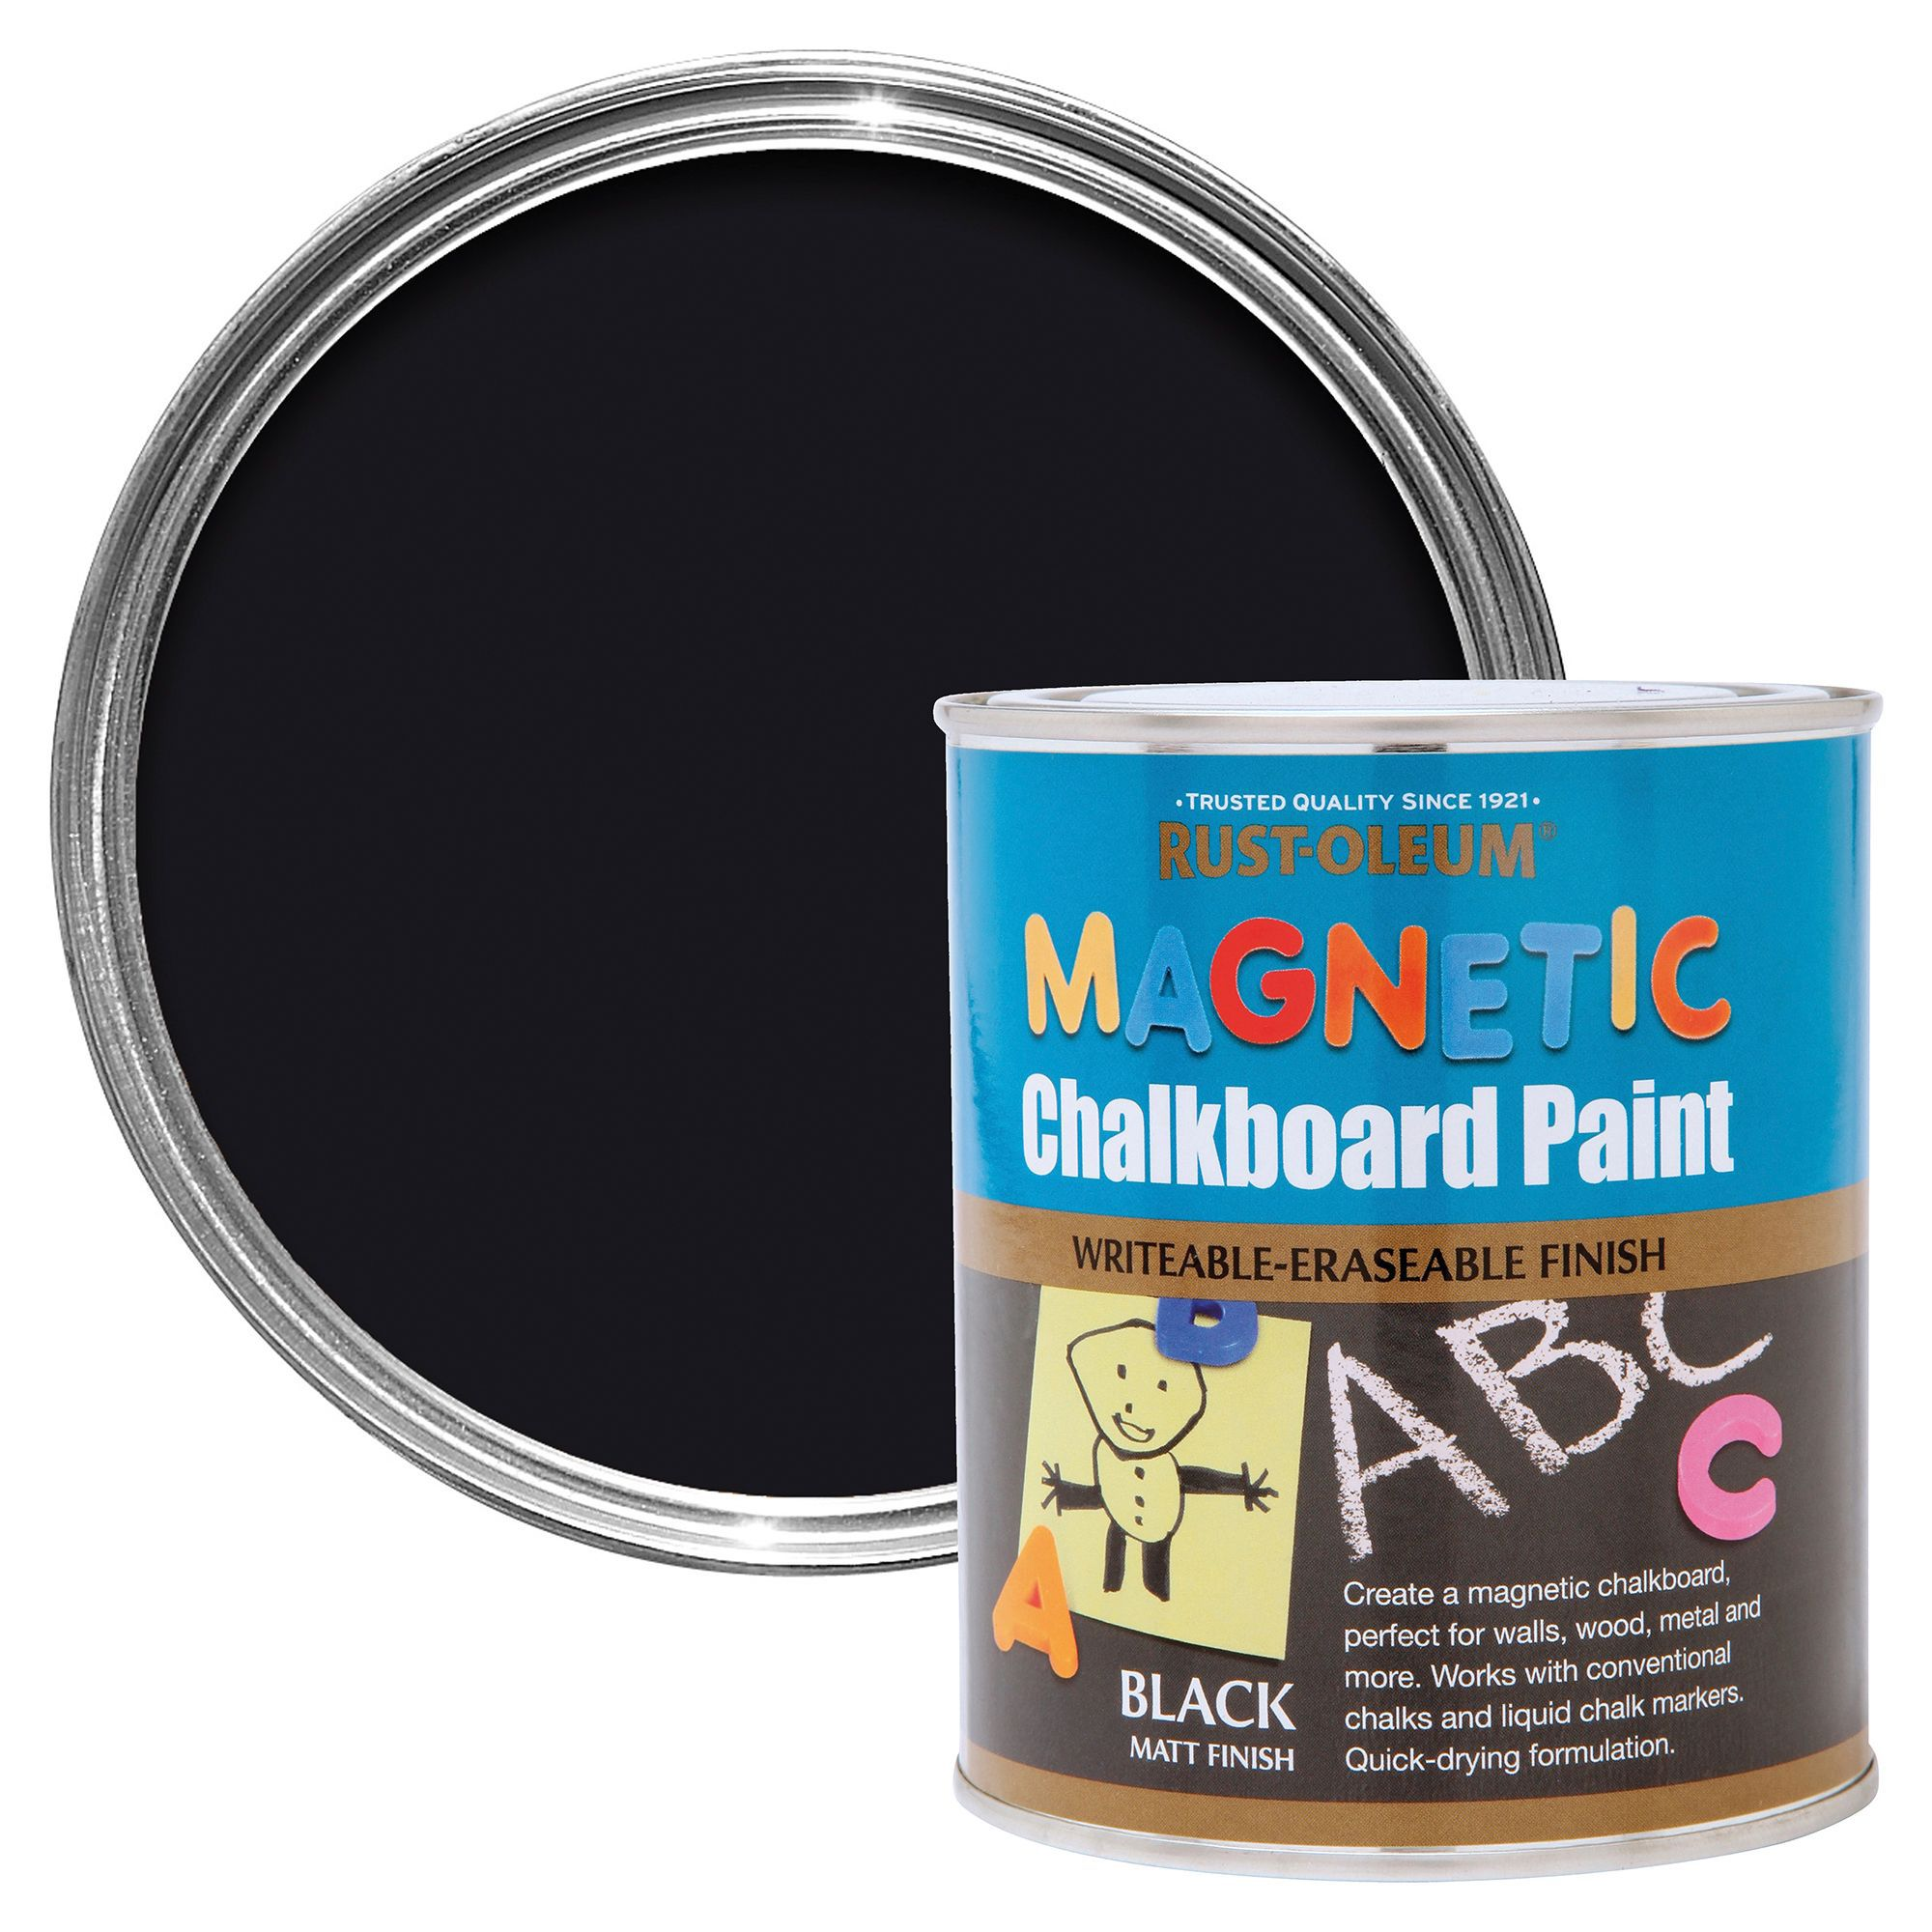 Rust-Oleum Black Magnetic Matt Chalkboard paint 750 ml | Departments ...